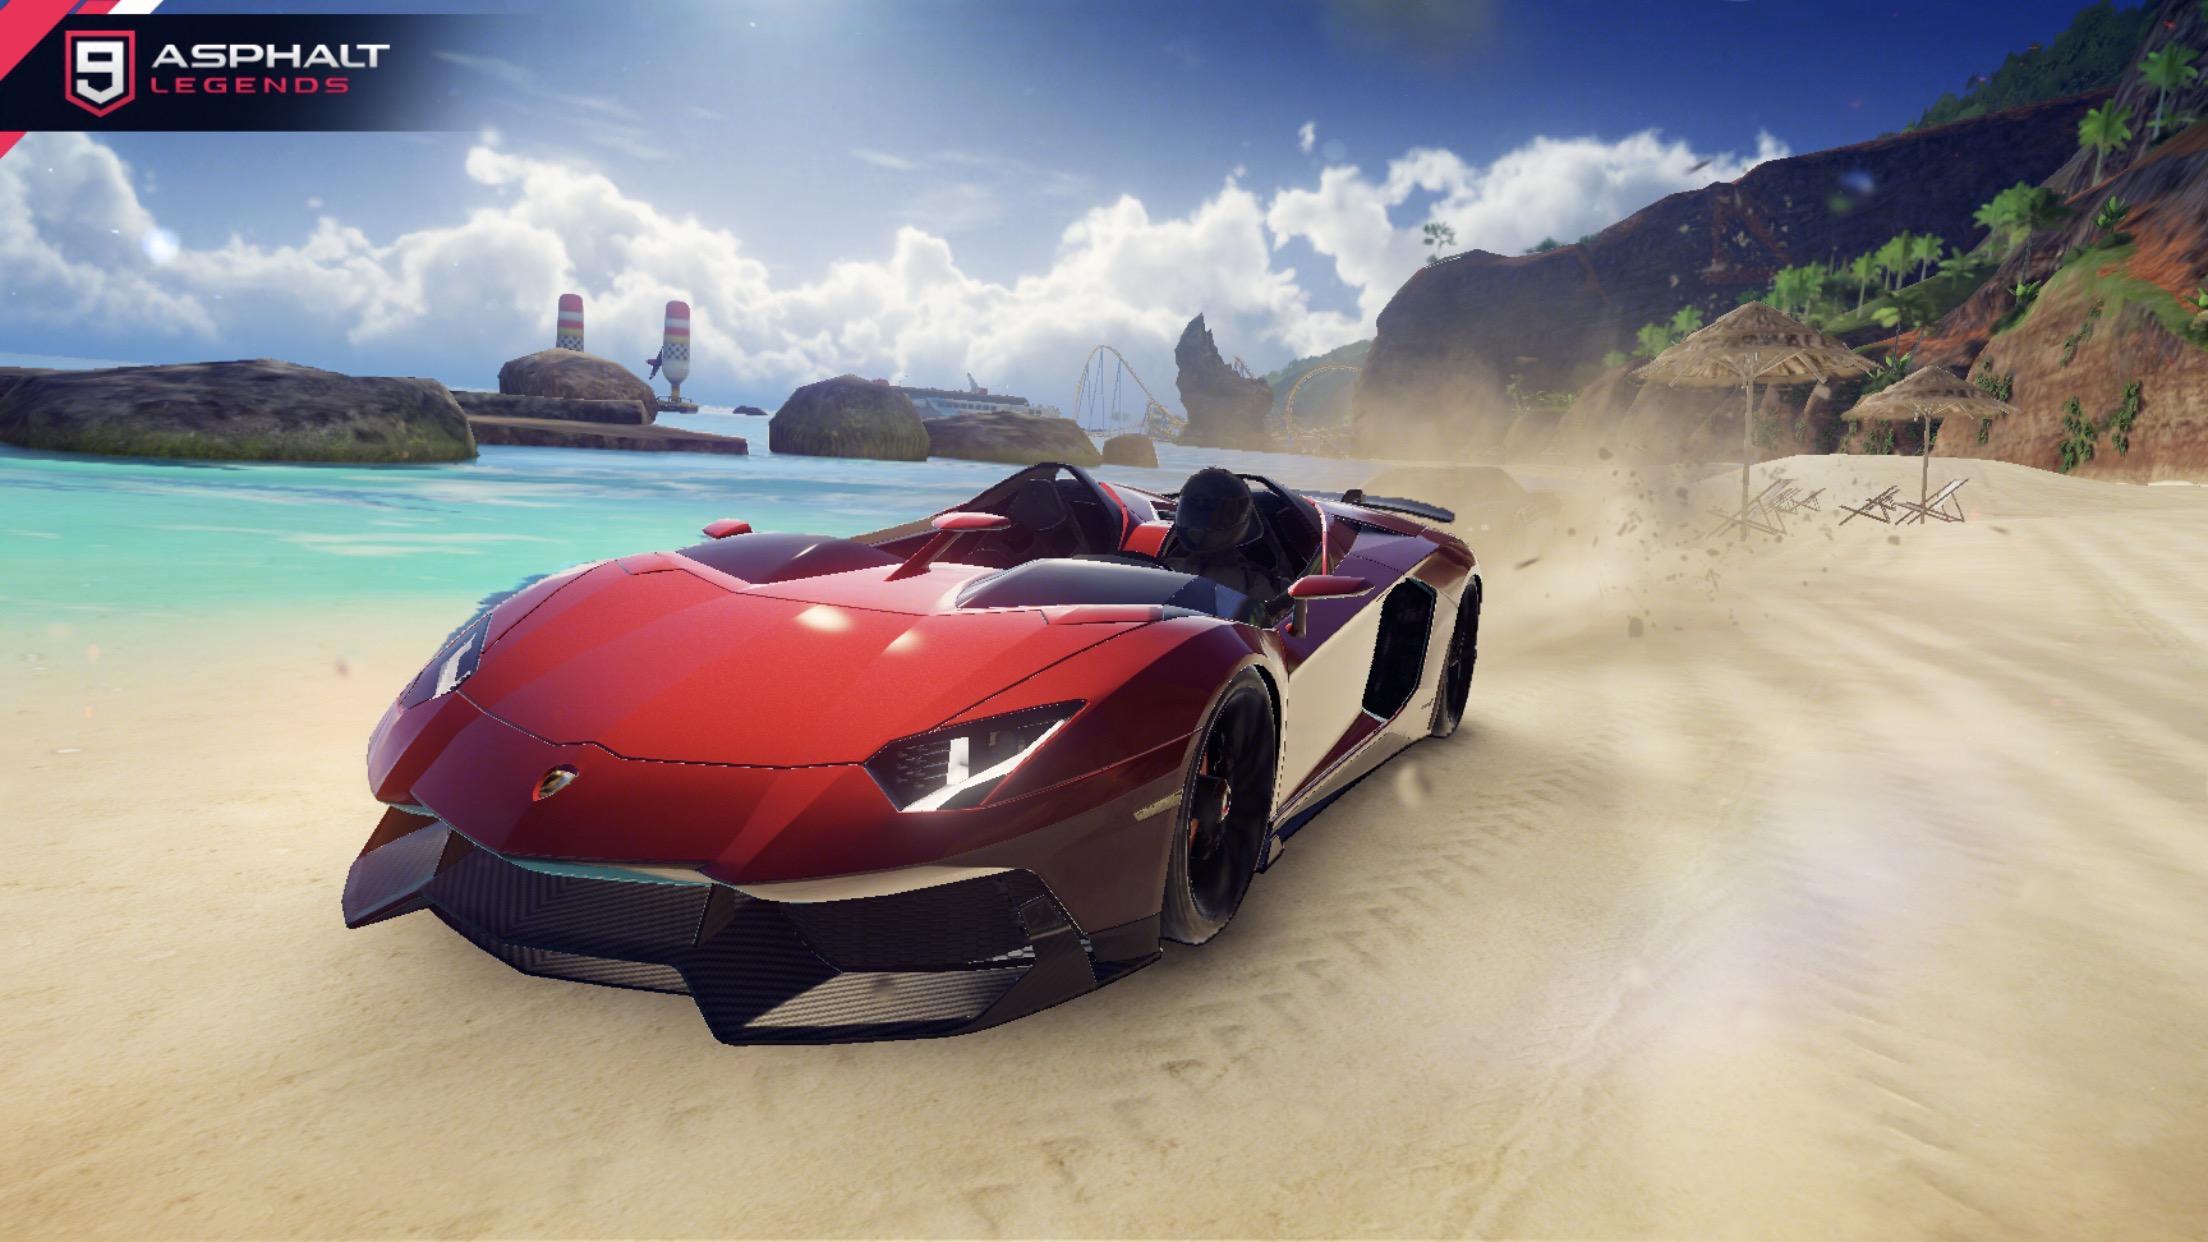 Lamborghini Aventador J Asphalt 9 Legends Database